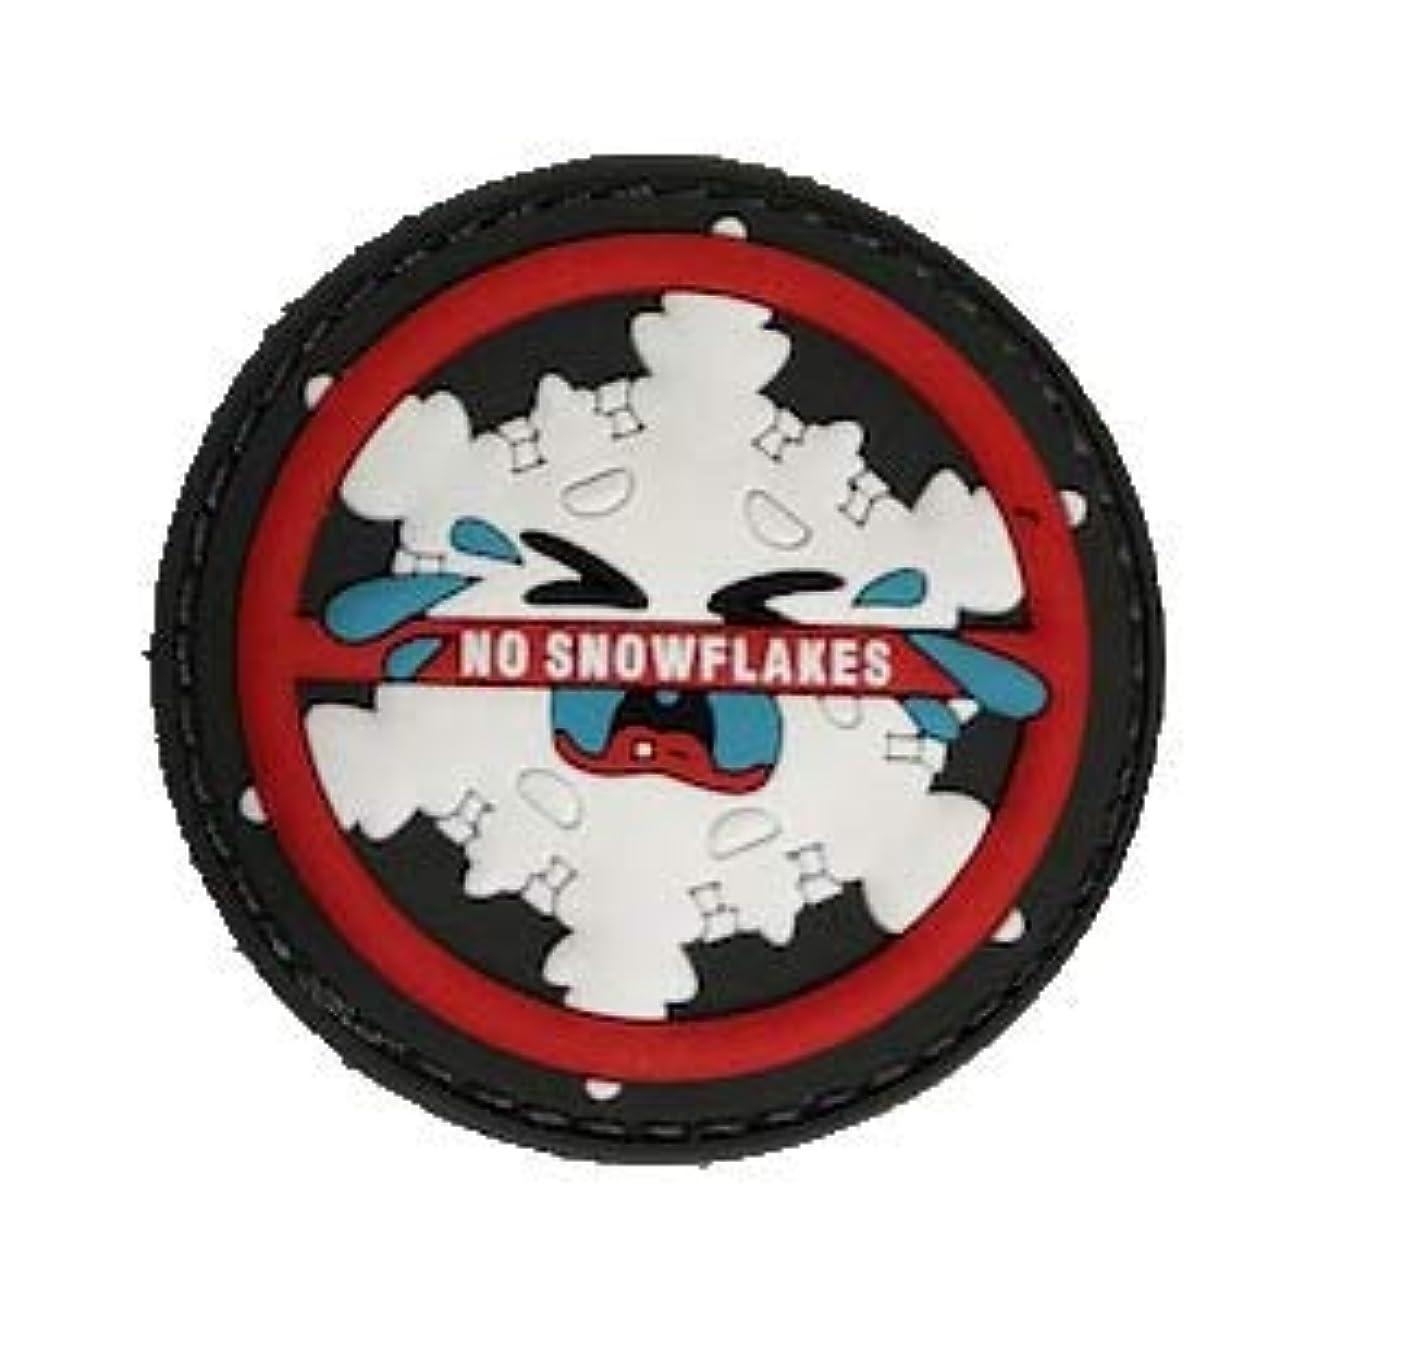 Tuff No Snowflakes PVC Patch 2